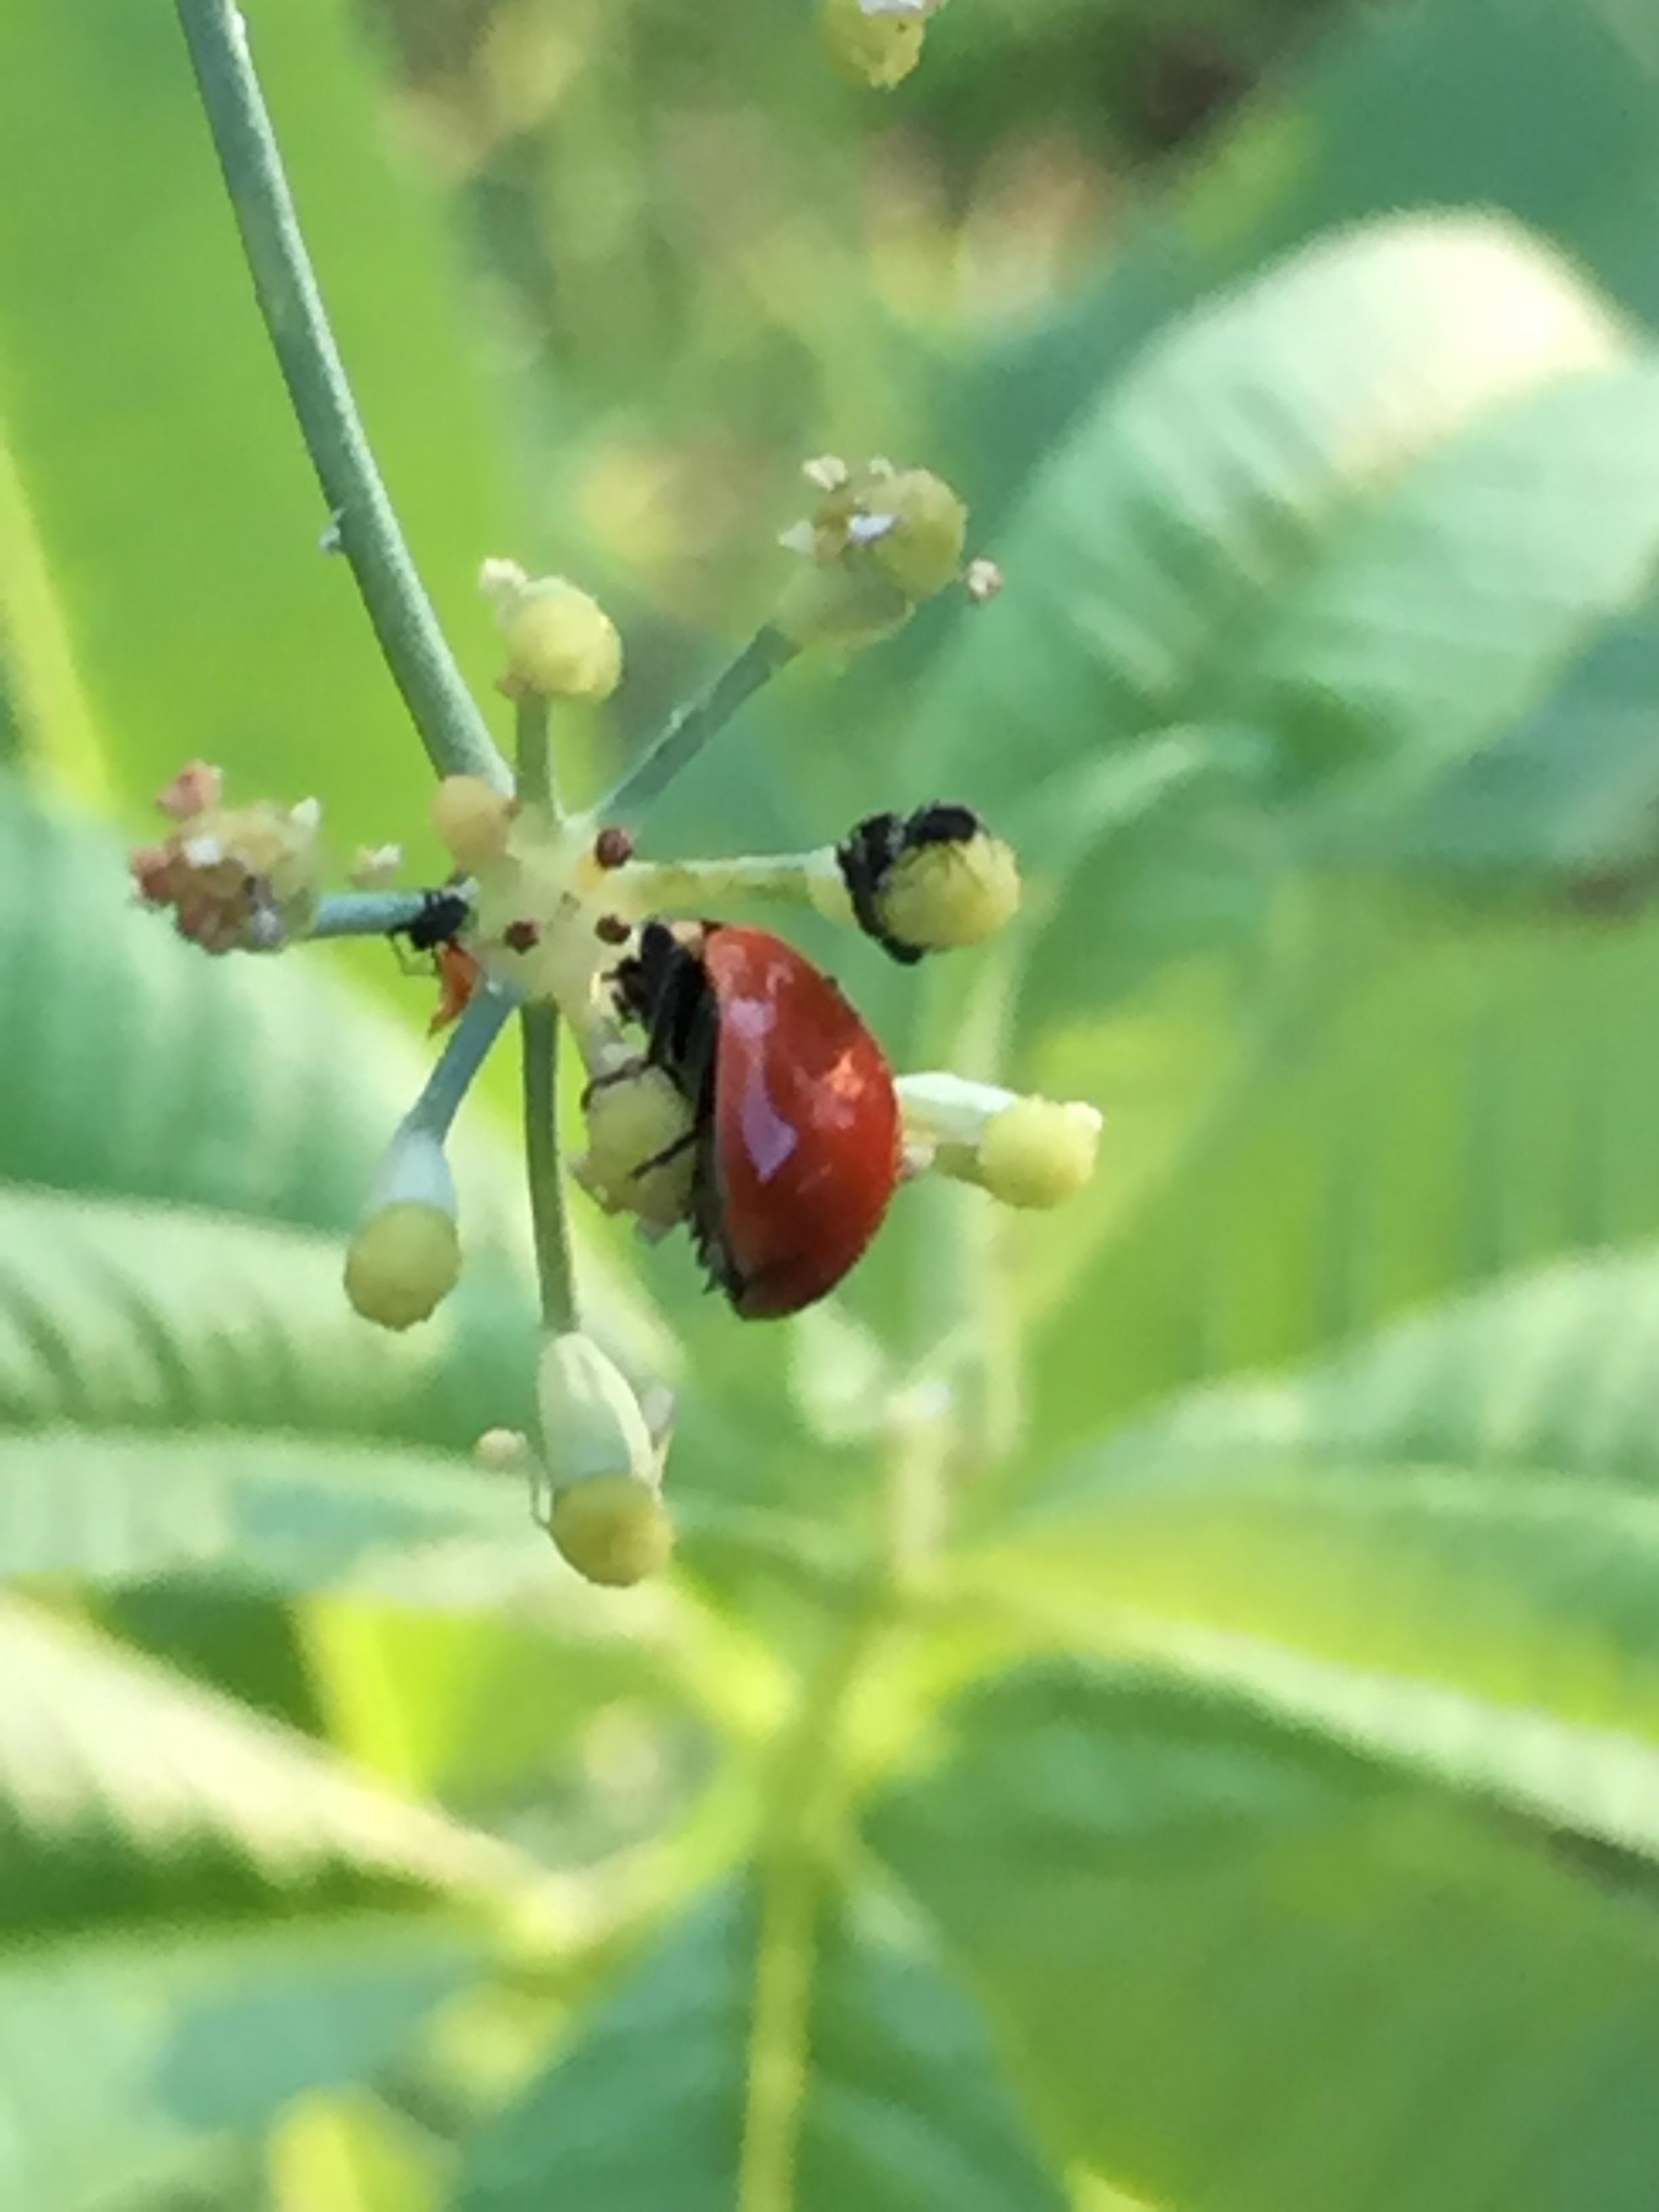 Ladybug eating aphids on fennel blossom